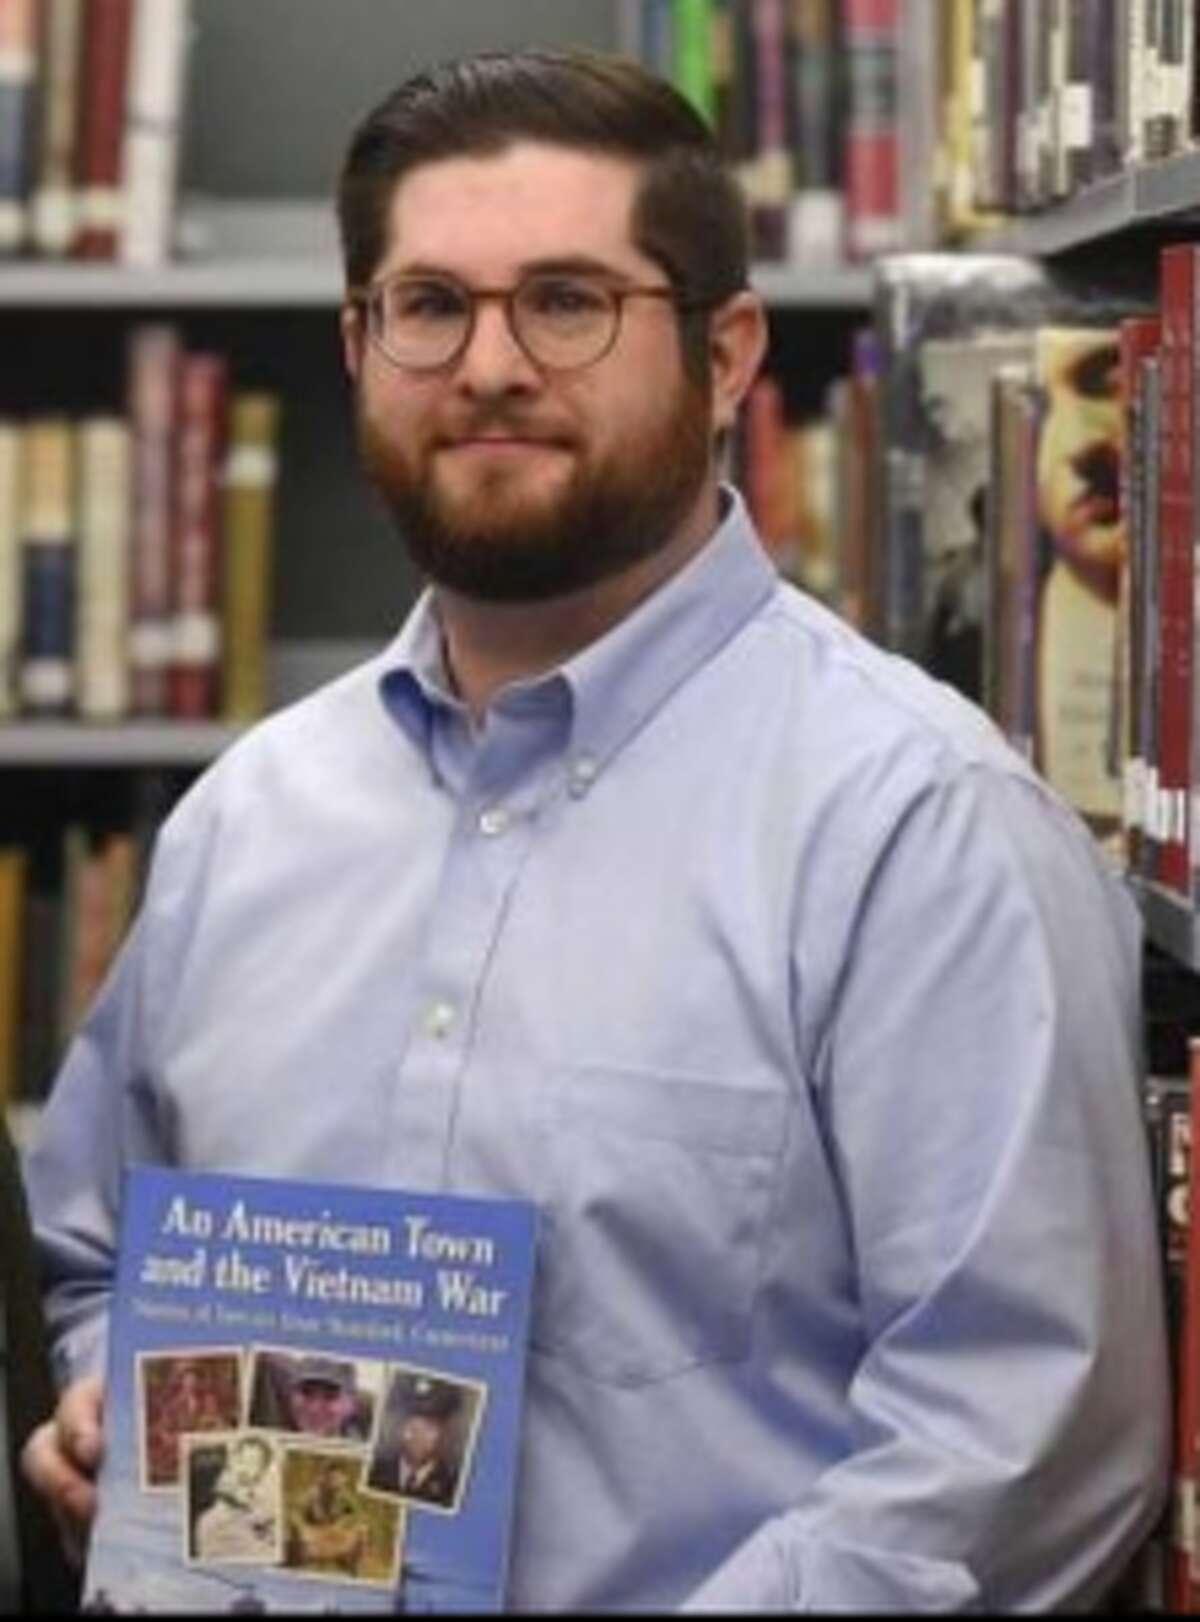 Matt Pavia has taught at Darien High School since 2003.